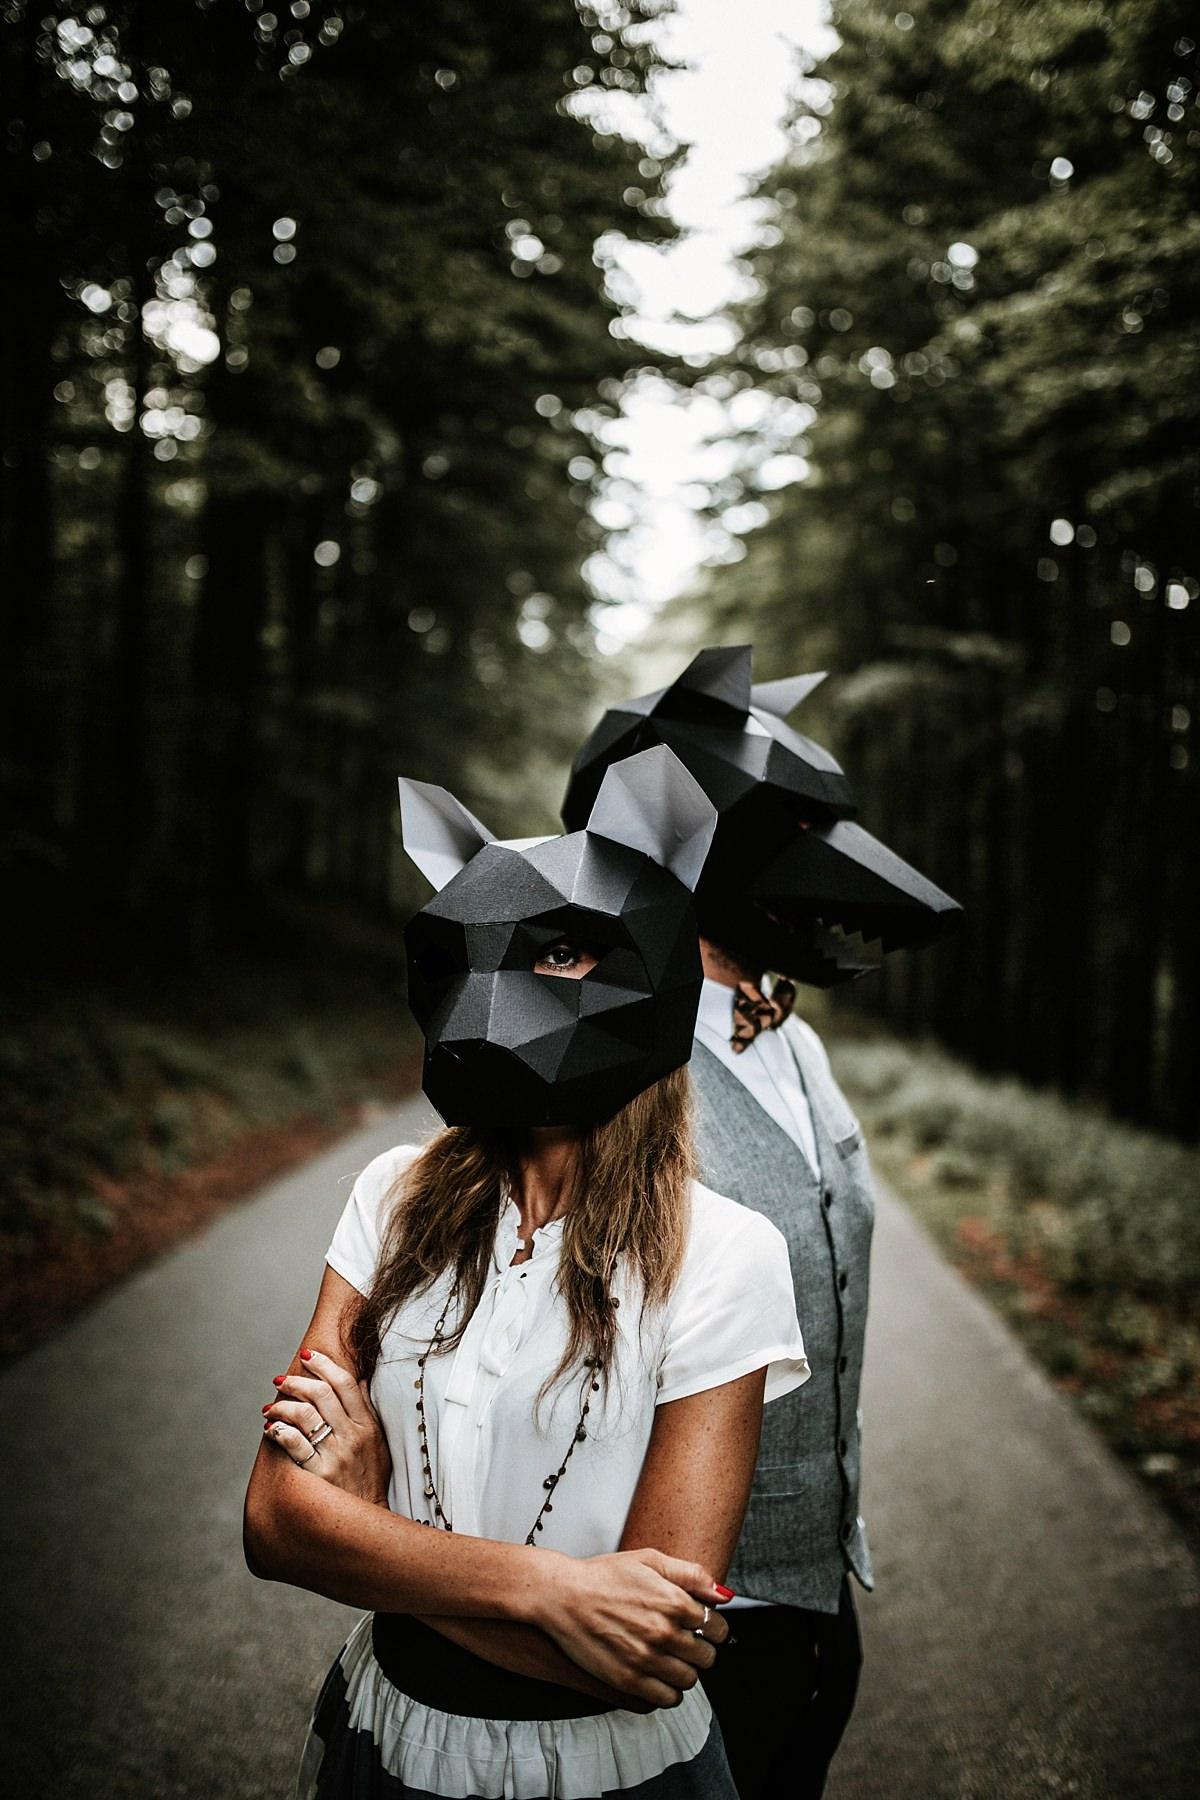 daniele-padovan-maschere-geometriche-animali_0025